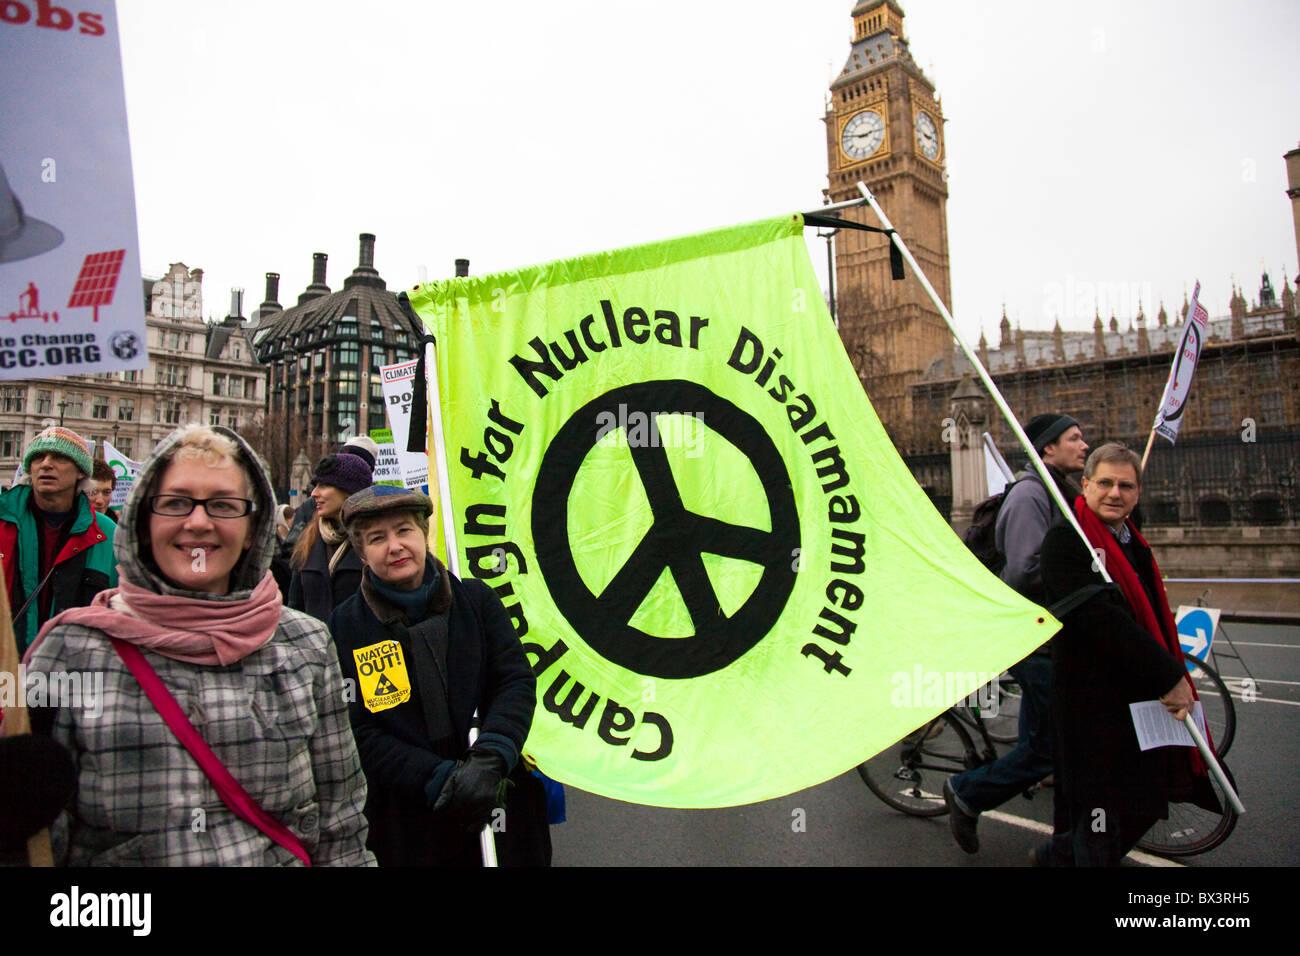 Cde banner en Westminster sobre el Cambio Climático en marzo de 2010, Londres, Reino Unido. Imagen De Stock